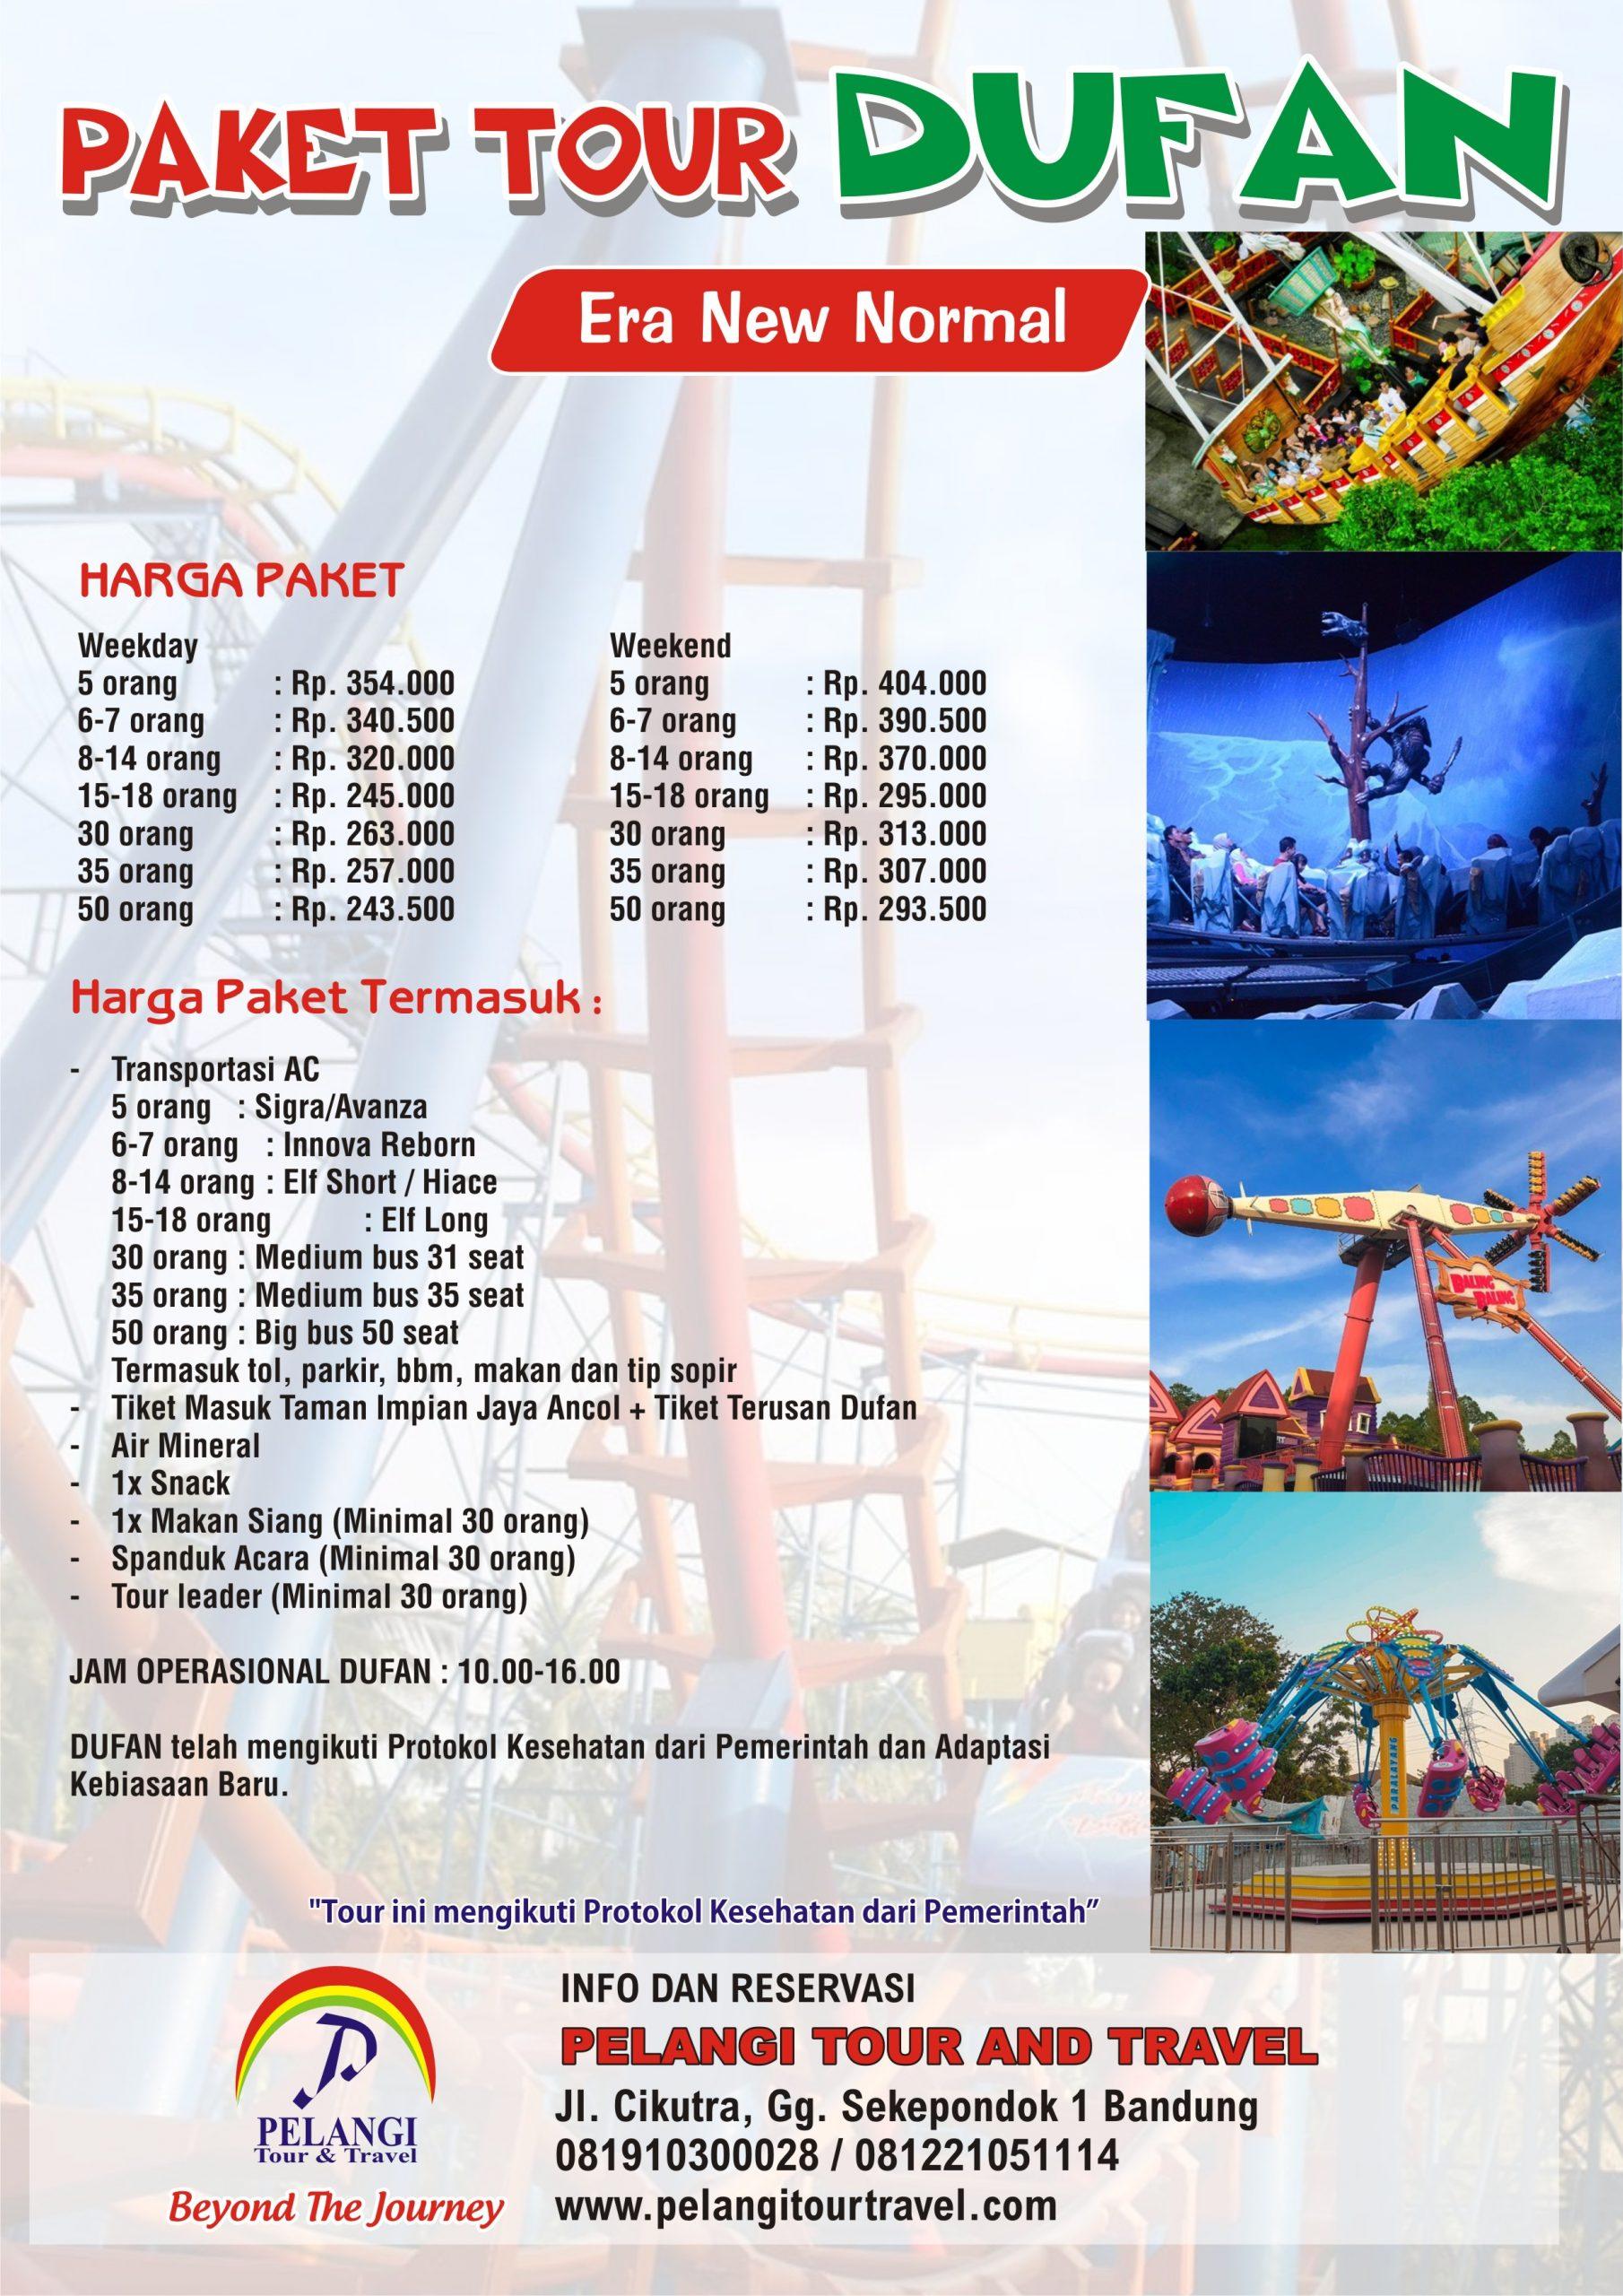 PAKET TOUR DUFAN 9  Pelangi Tour & Travel